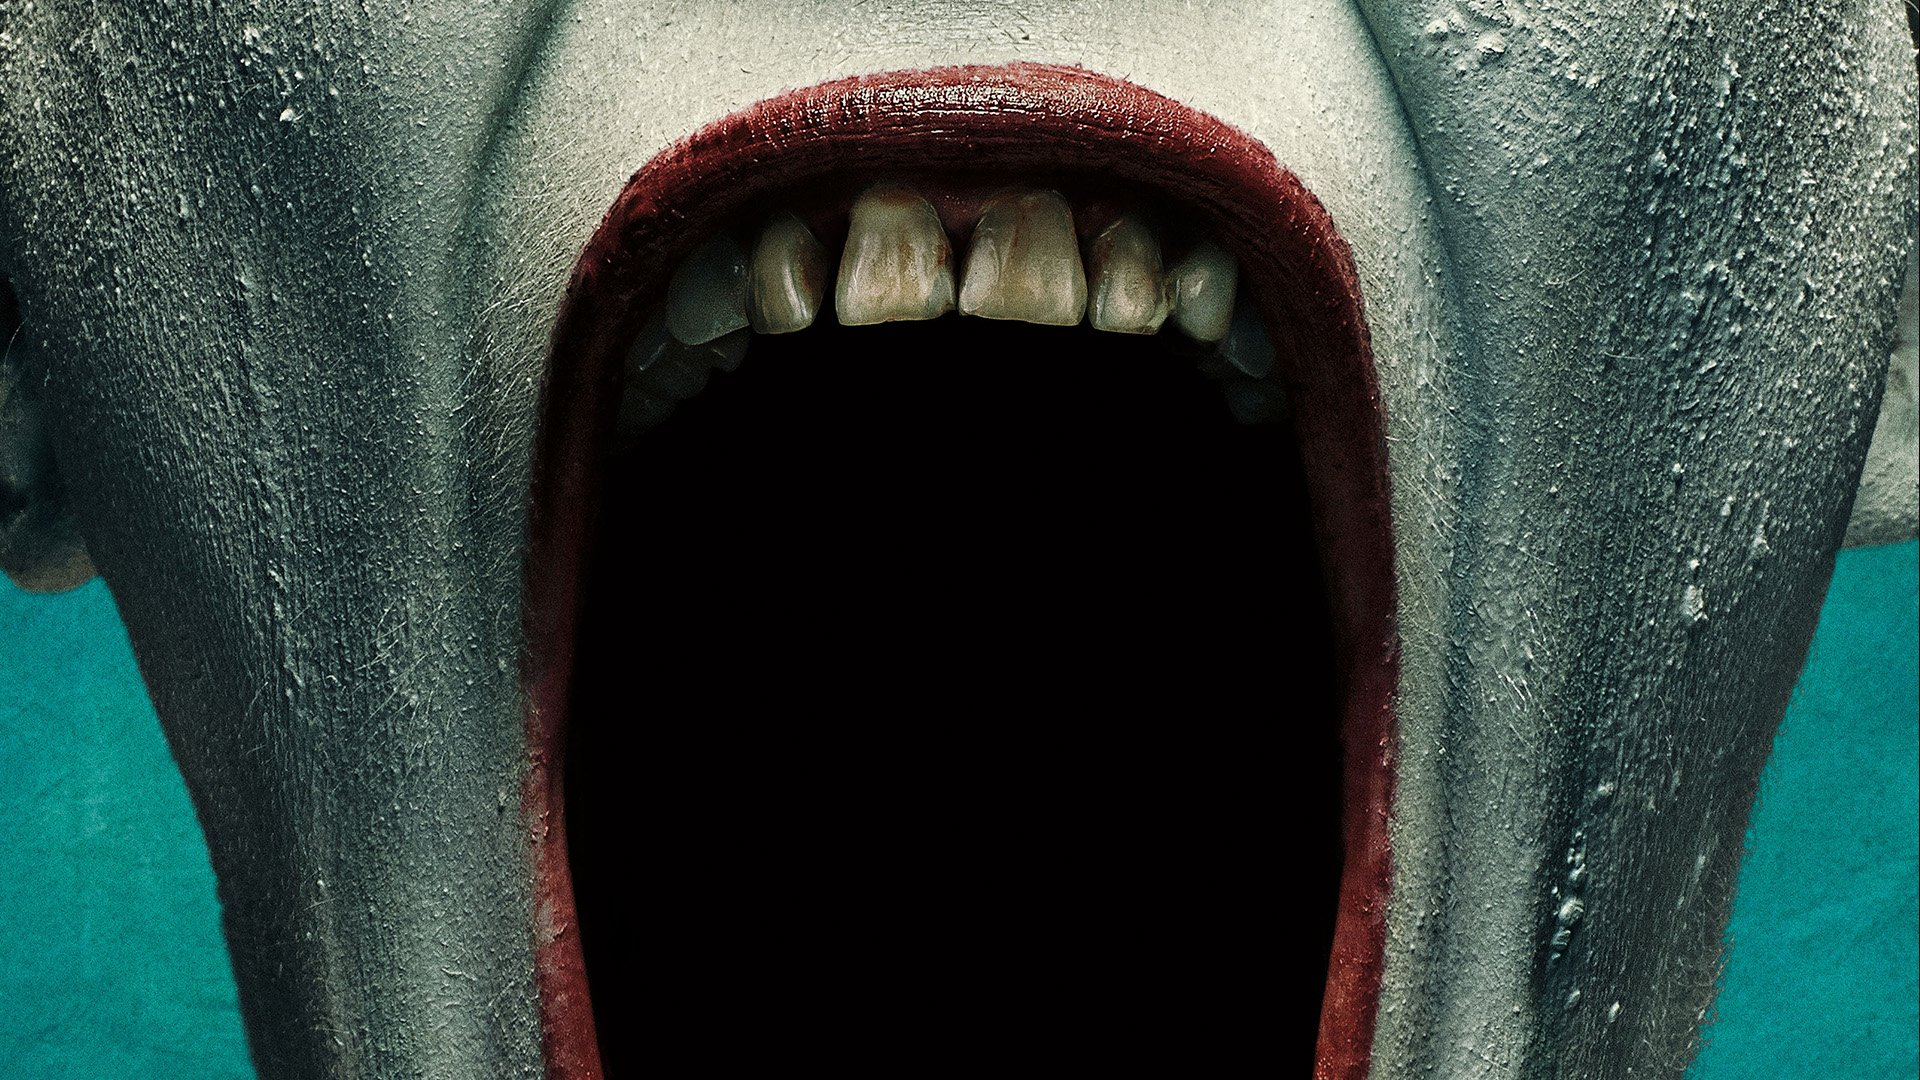 American Horror Story Wallpaper Iphone American Horror Story Freak Show Full Hd Wallpaper And